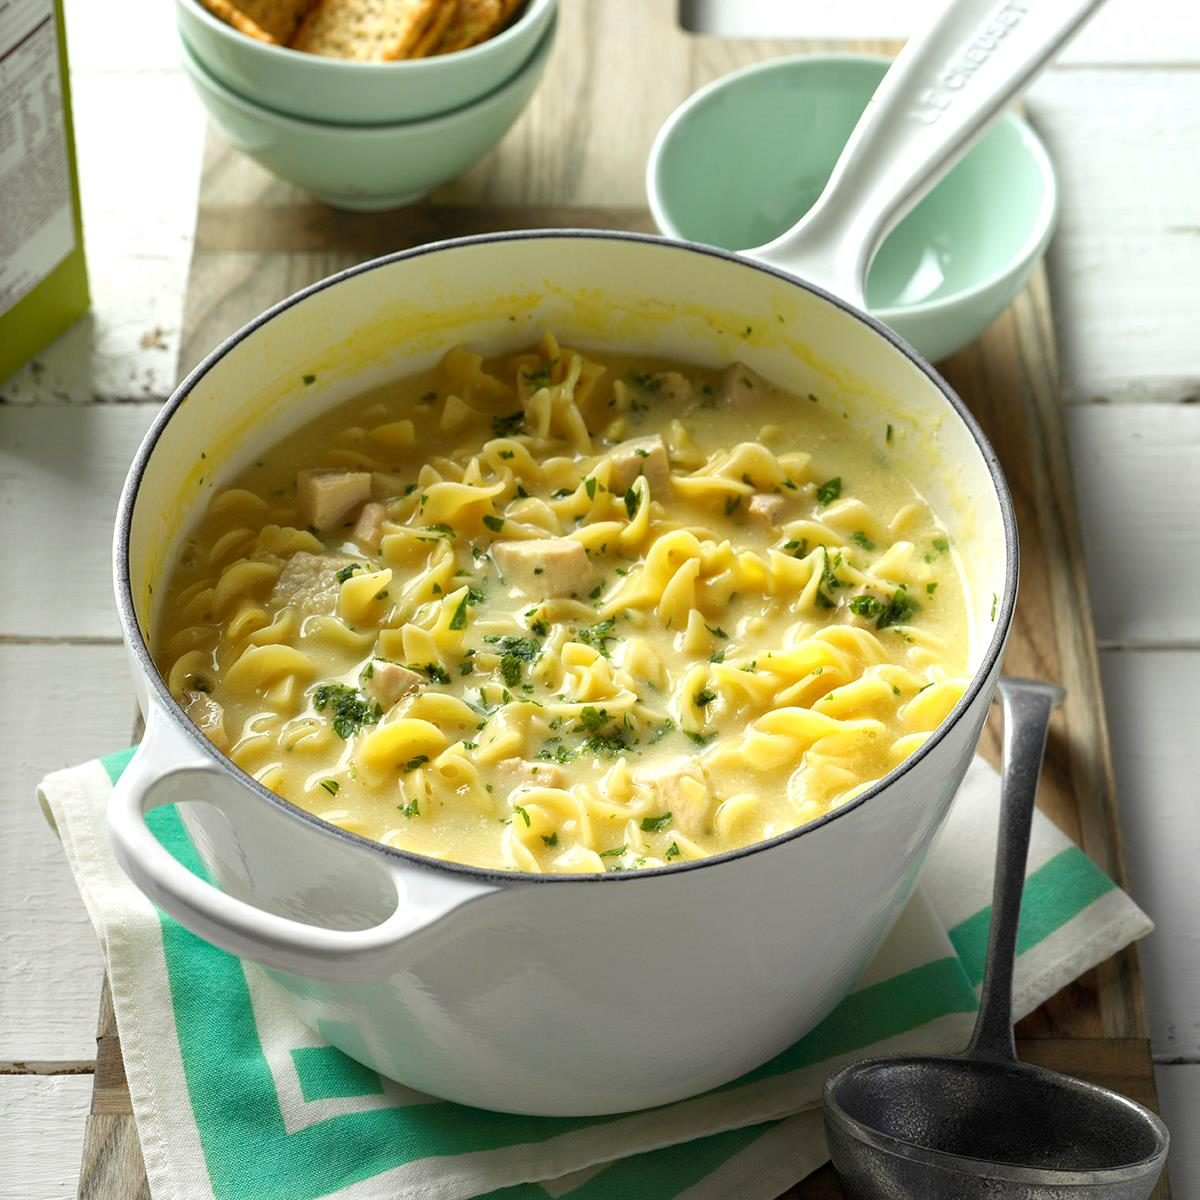 Utah: Comforting Chicken Noodle Soup